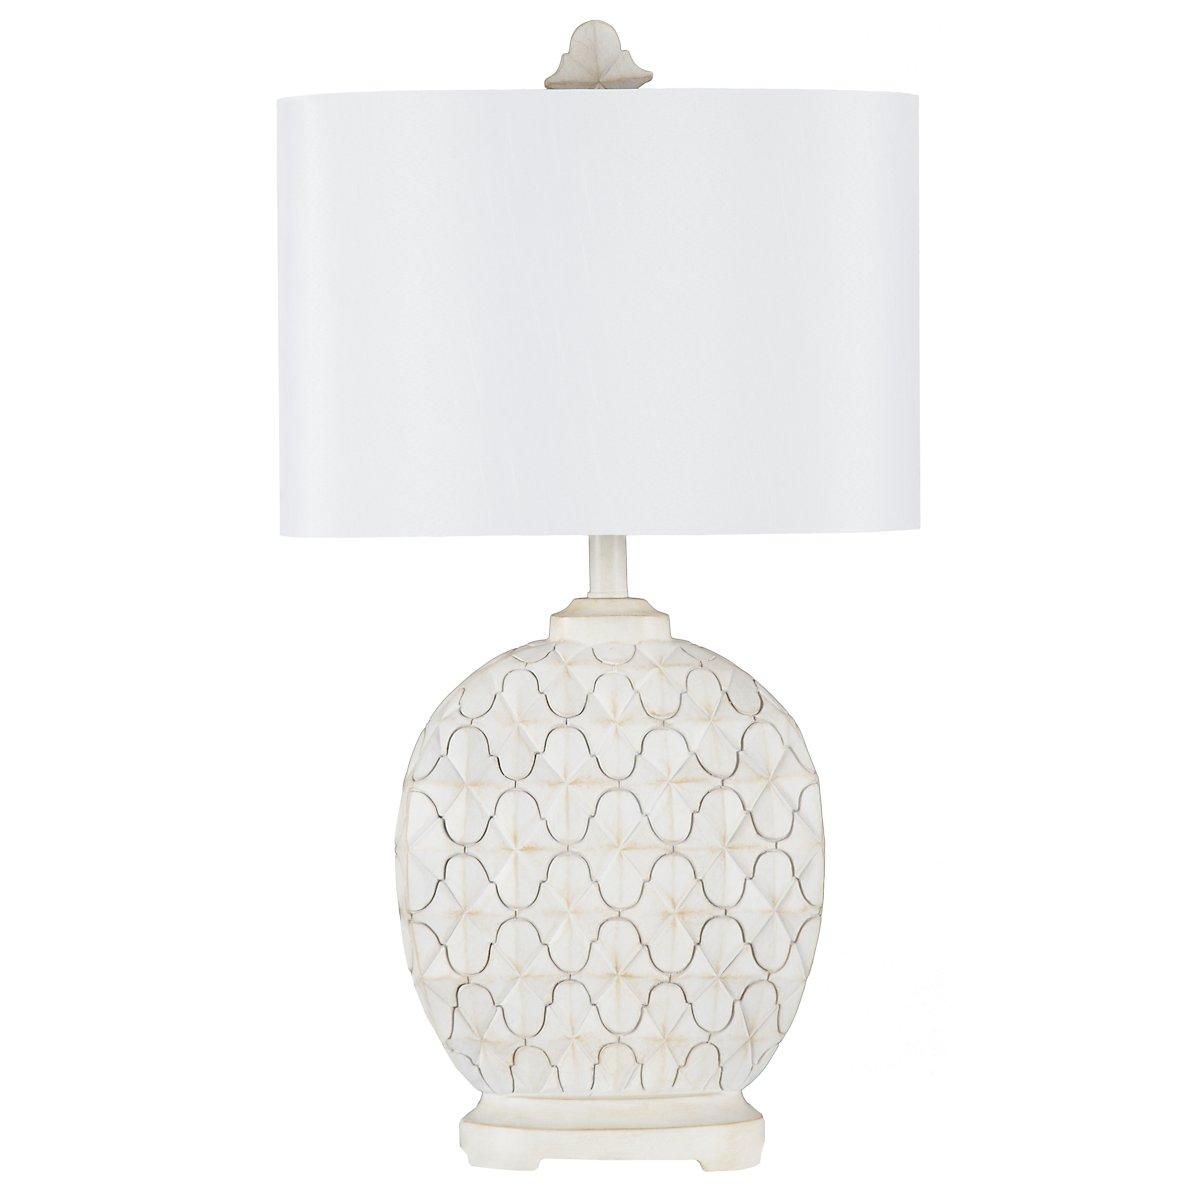 Alabaster White Table Lamp